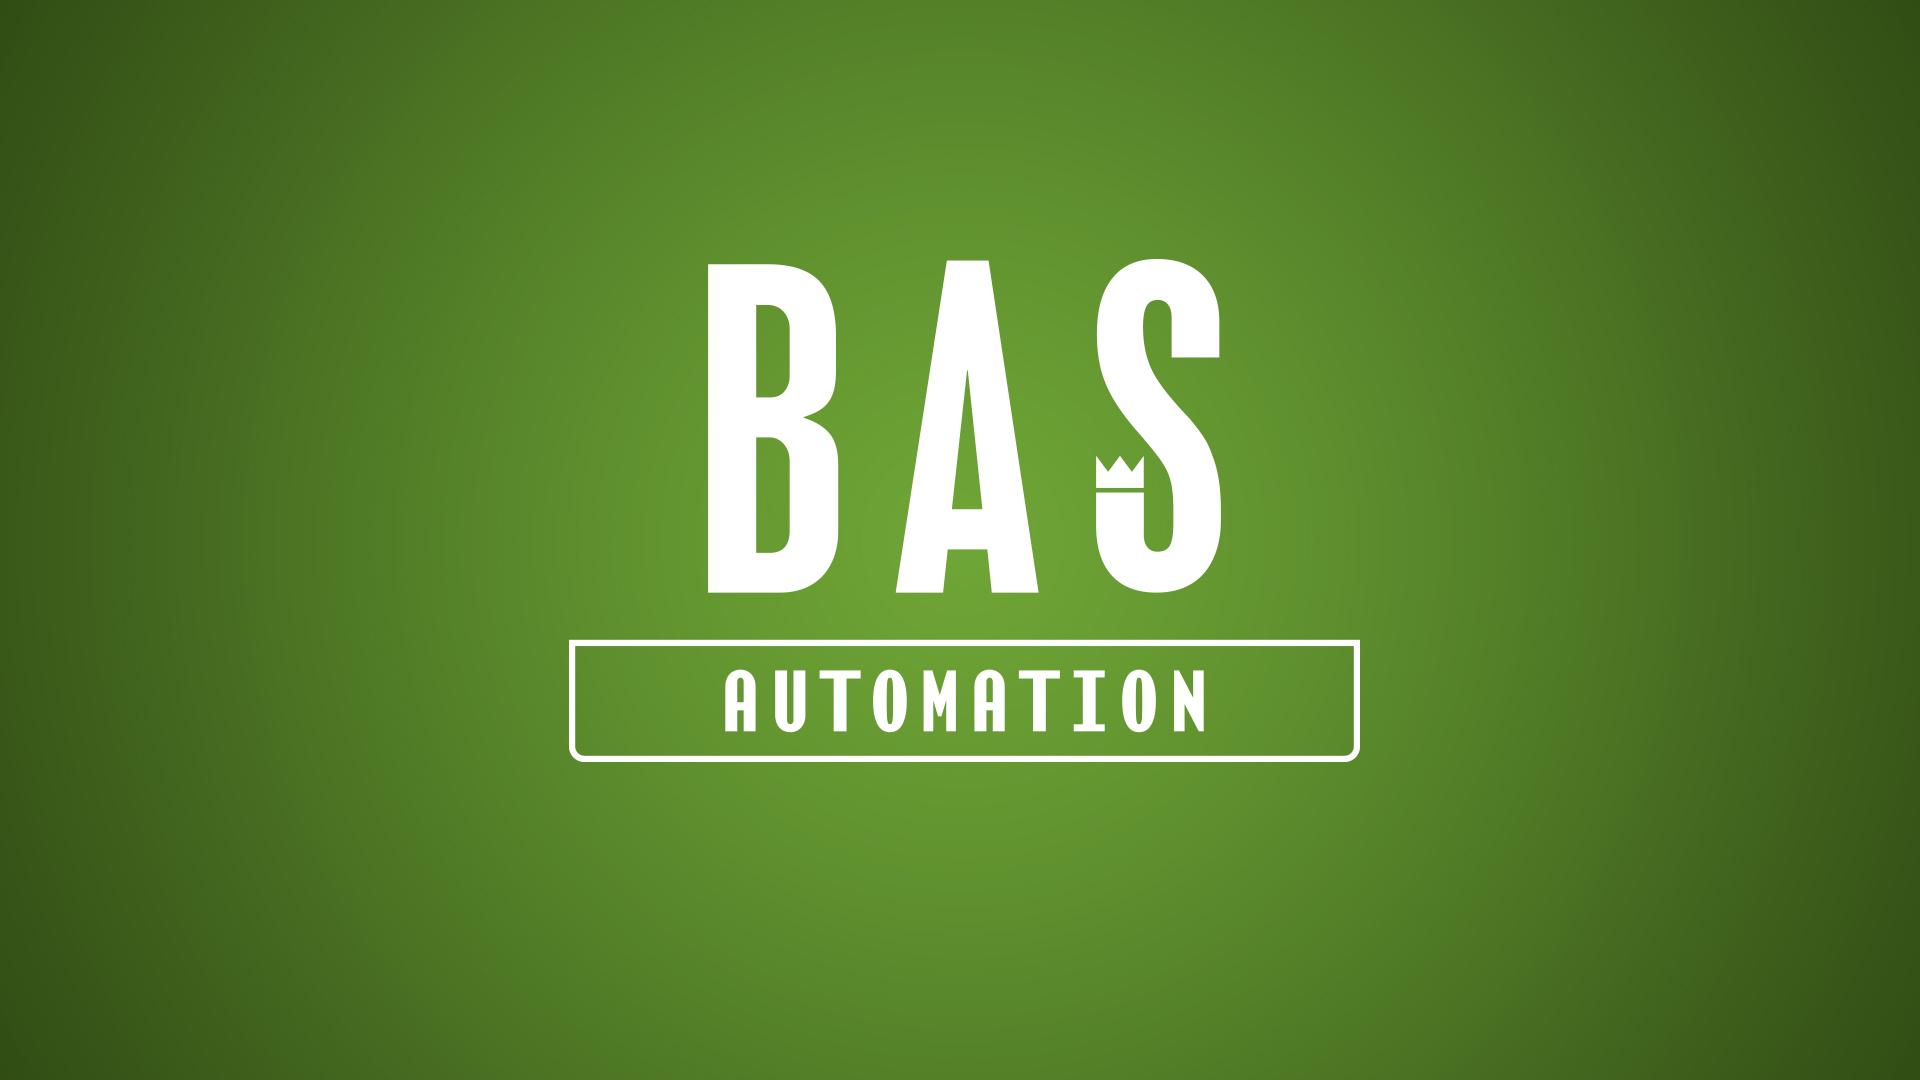 bas-1.jpg